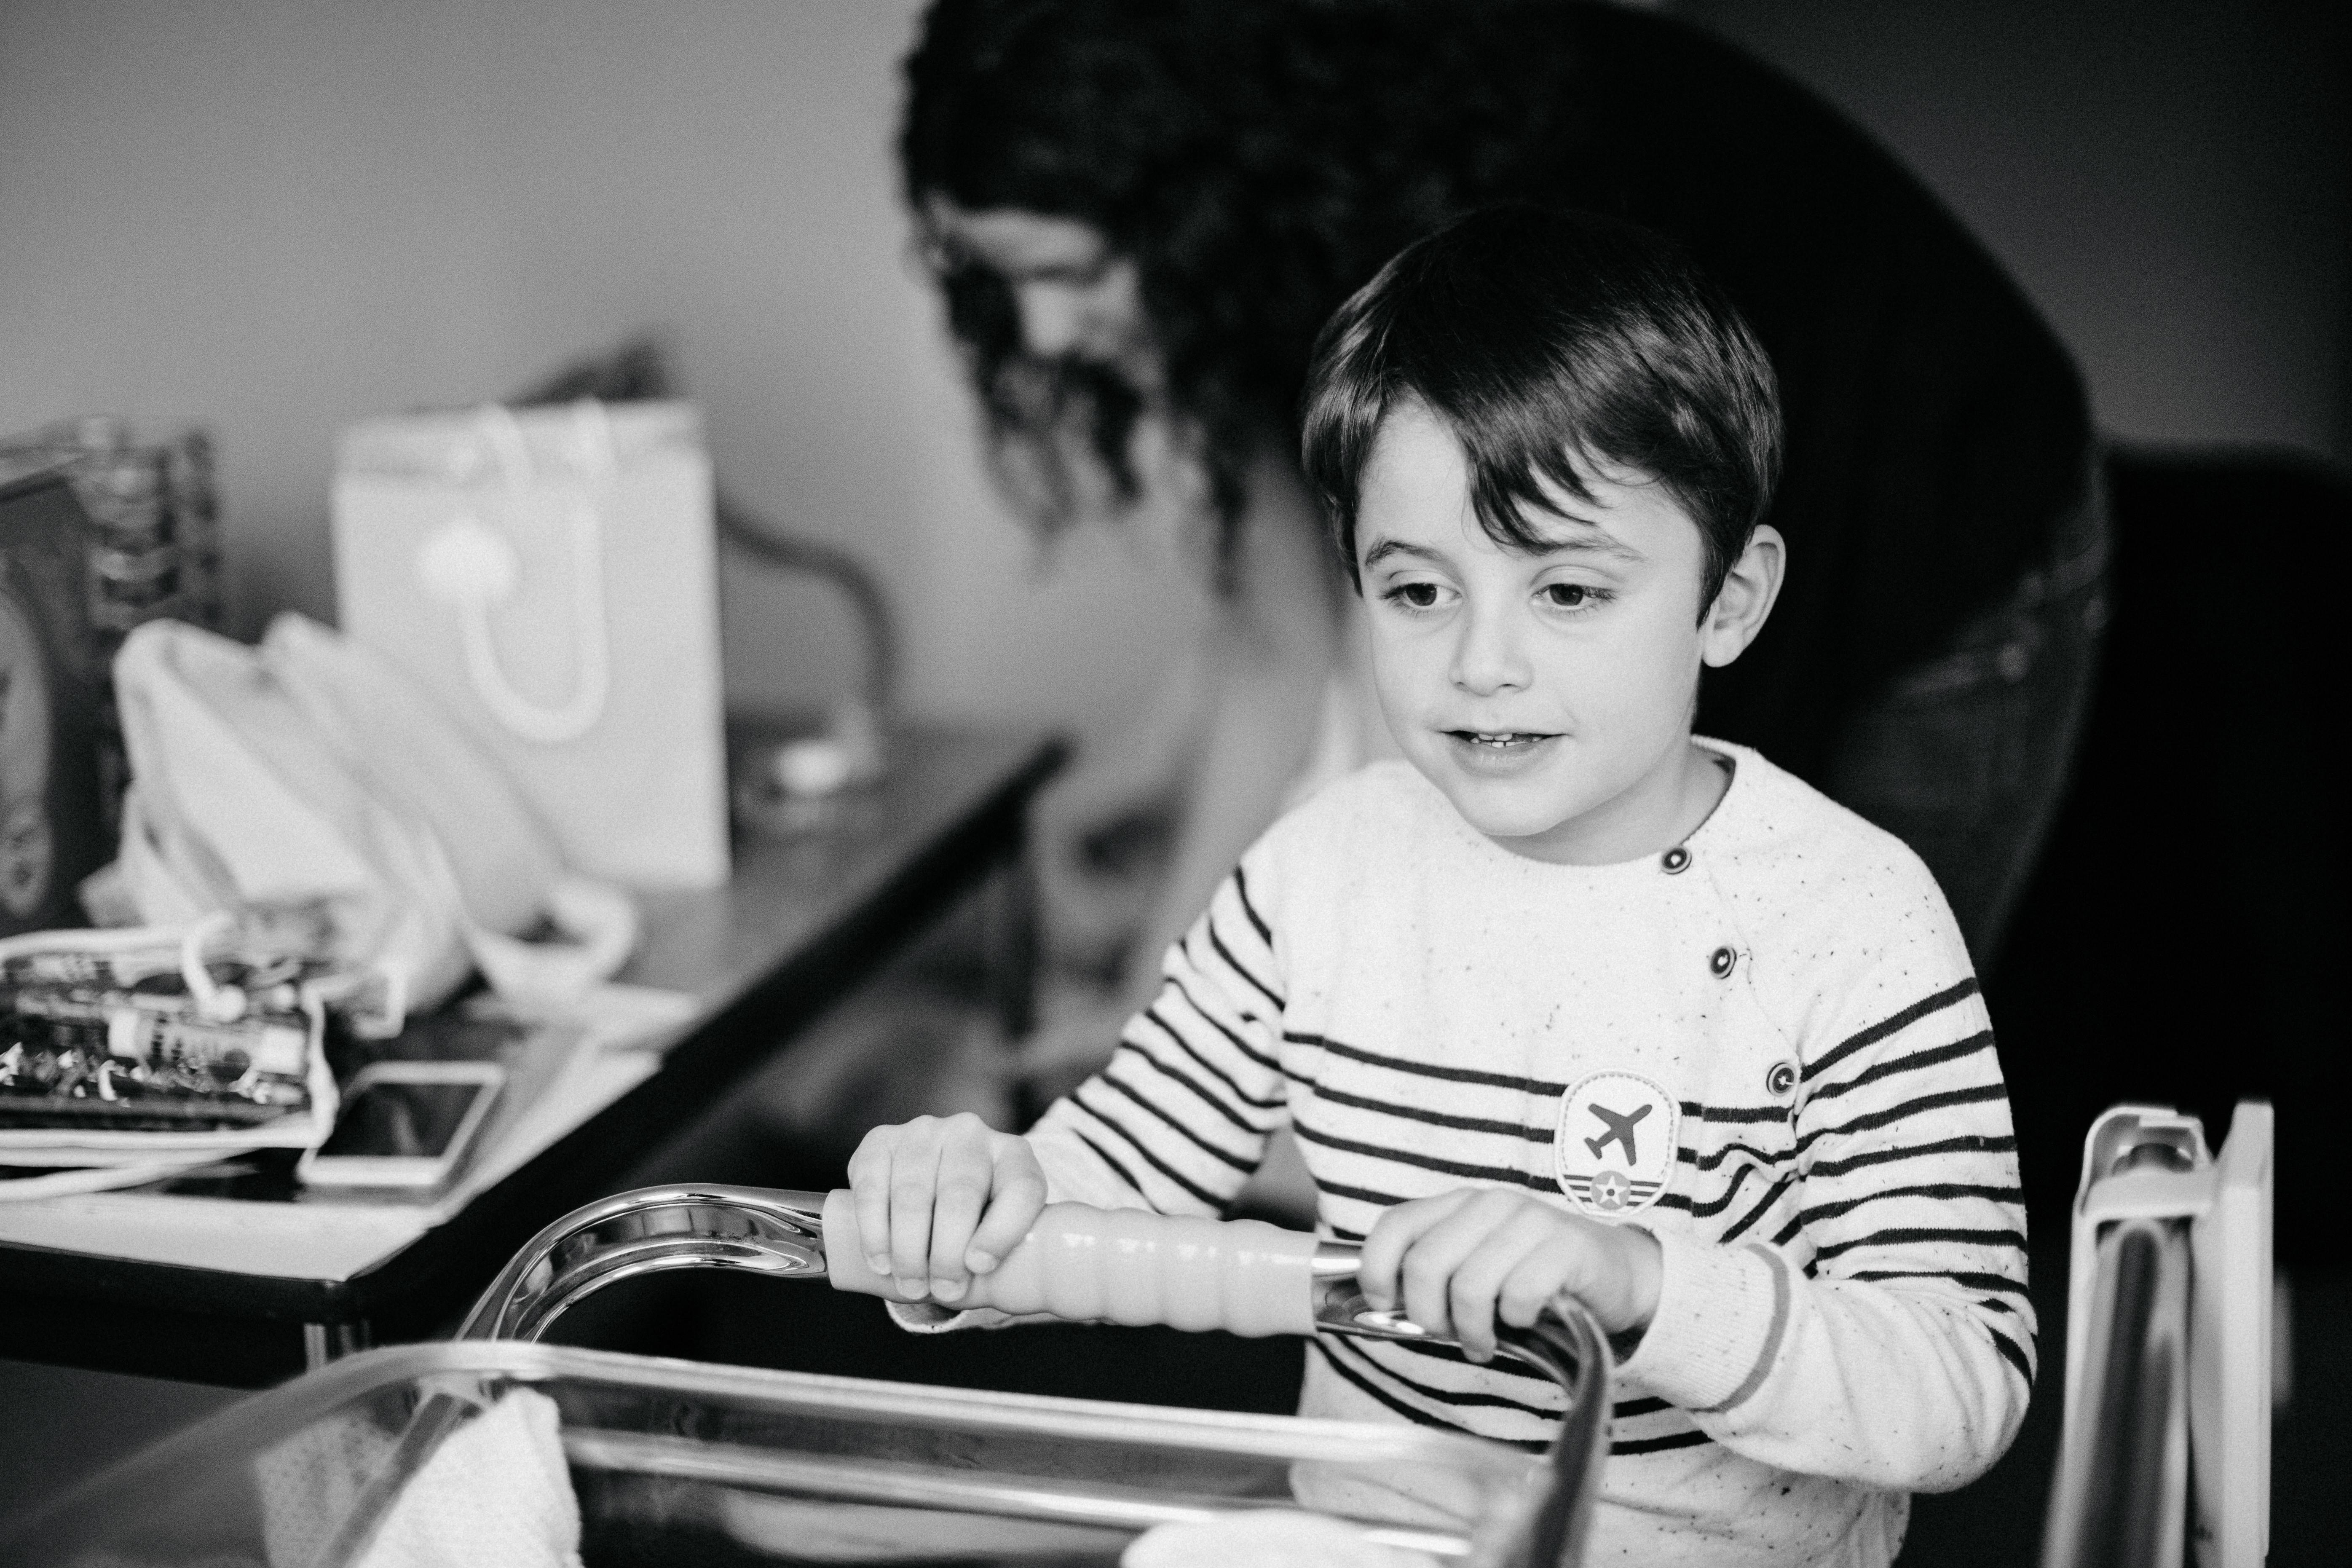 chocolat-chaud-lifestyle-photographes-seance naissance maternite valentine hd 10 1